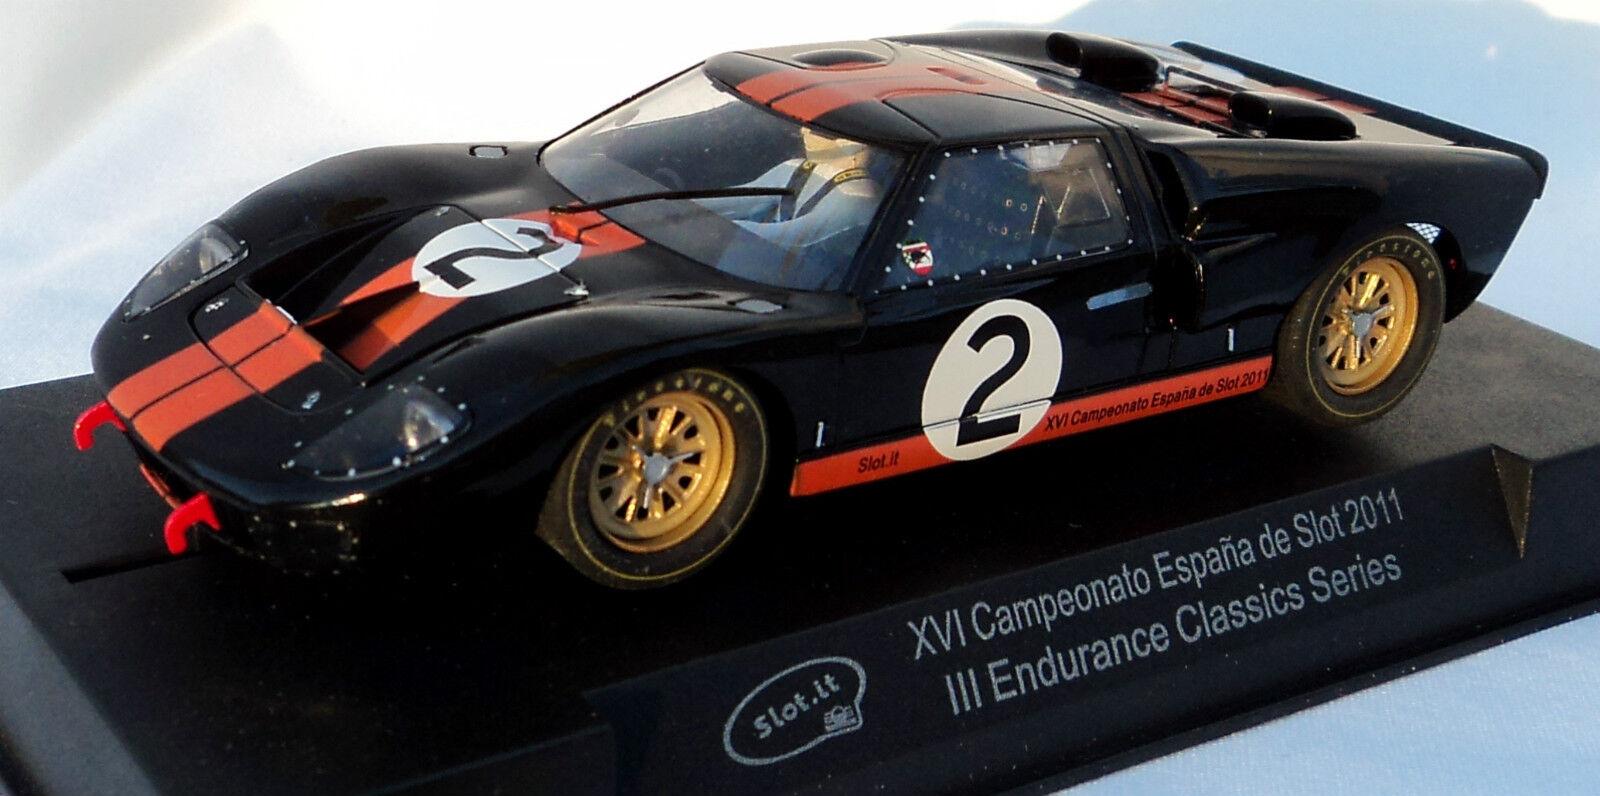 SLOT IT sisc 20 A FORD GT40 espagnol Championnats Limited Edition 1 32 SC20A